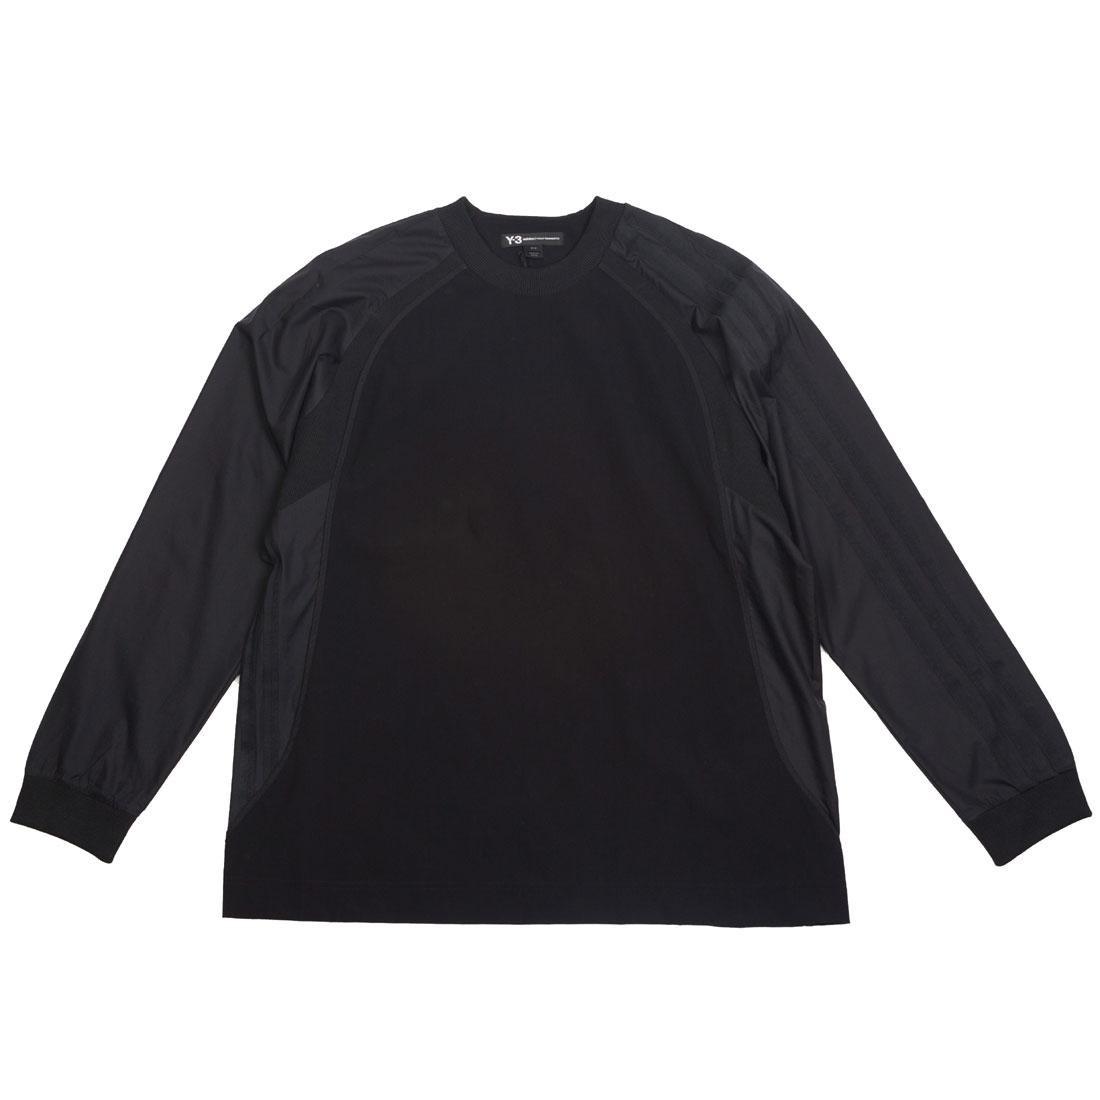 Adidas Y-3 Men 3 Stripes Light Nylon Mix Long Sleeve Tee (black)